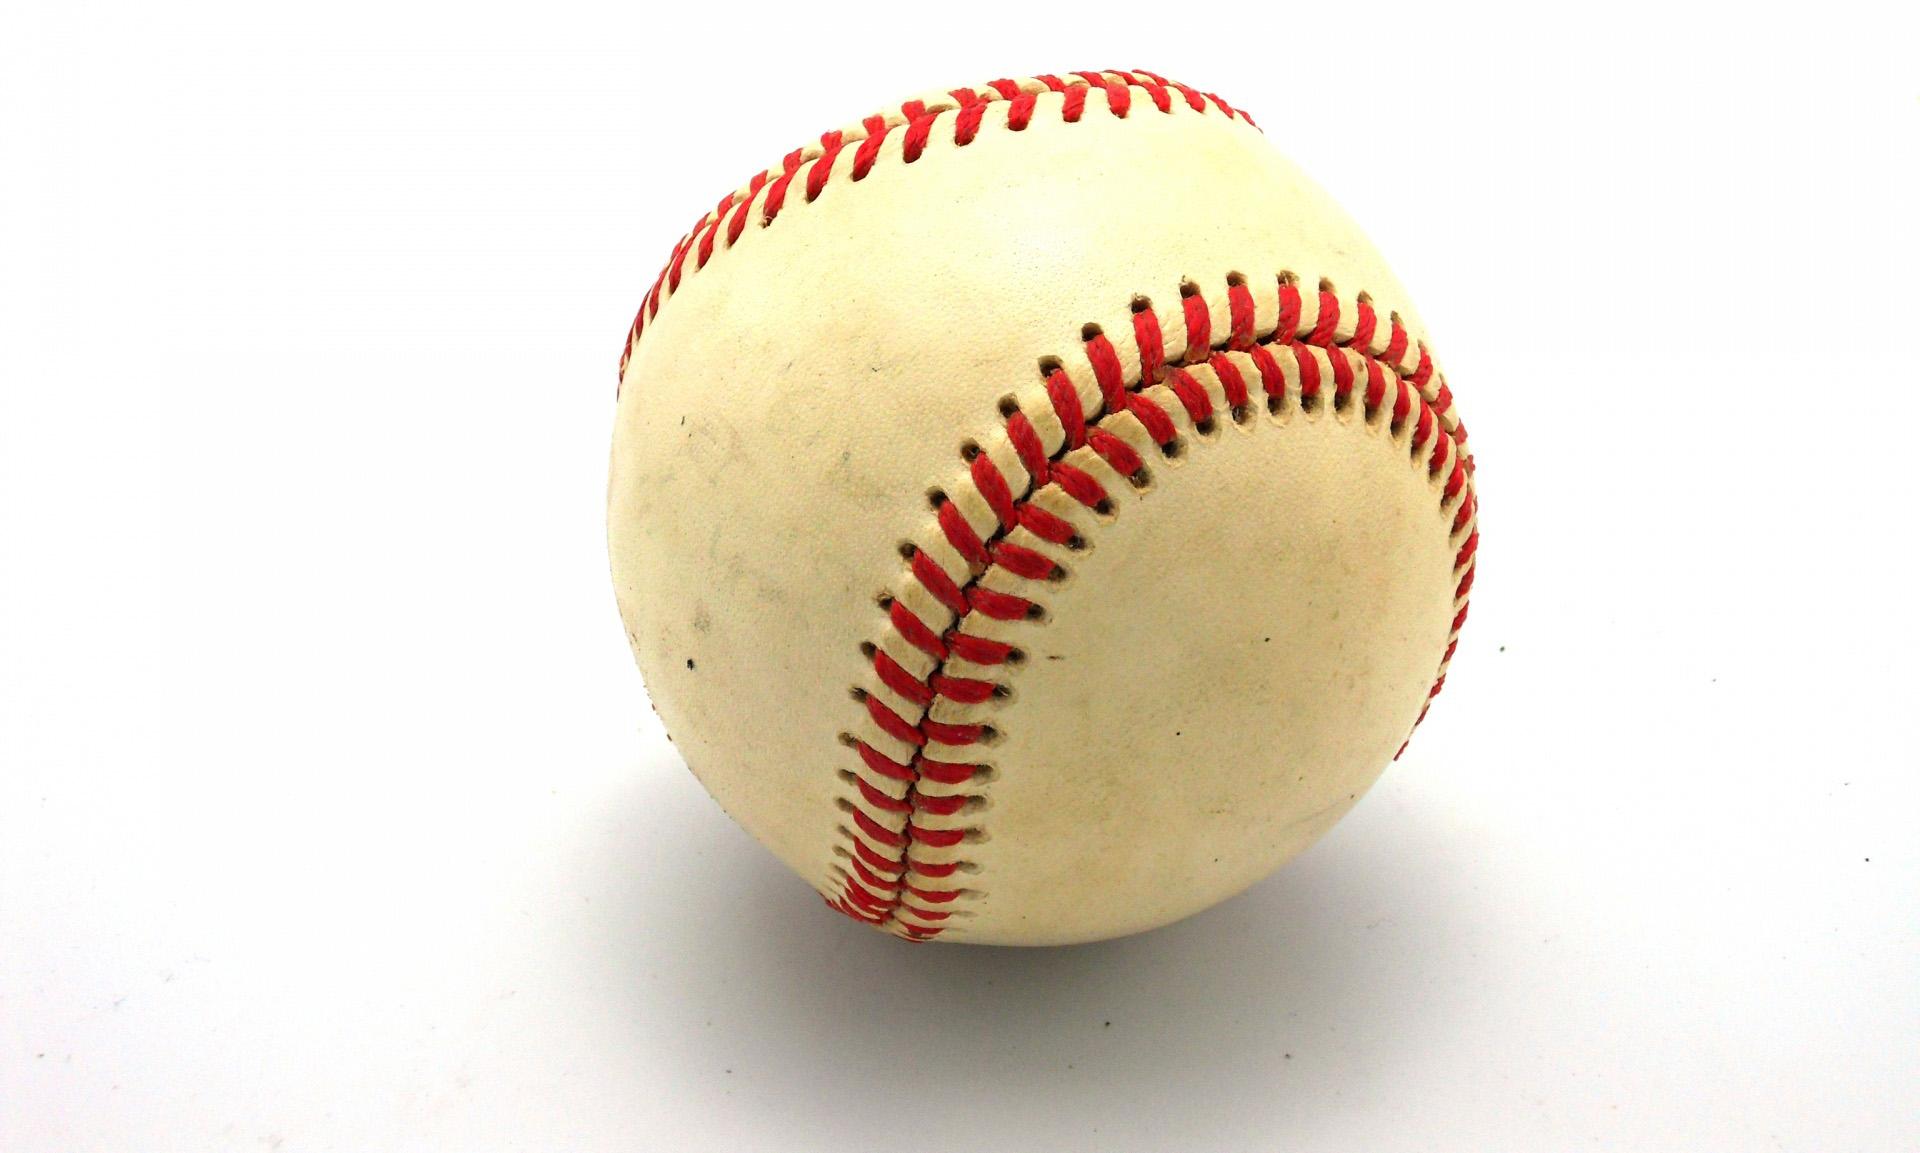 baseball-ball-isolated-on-white